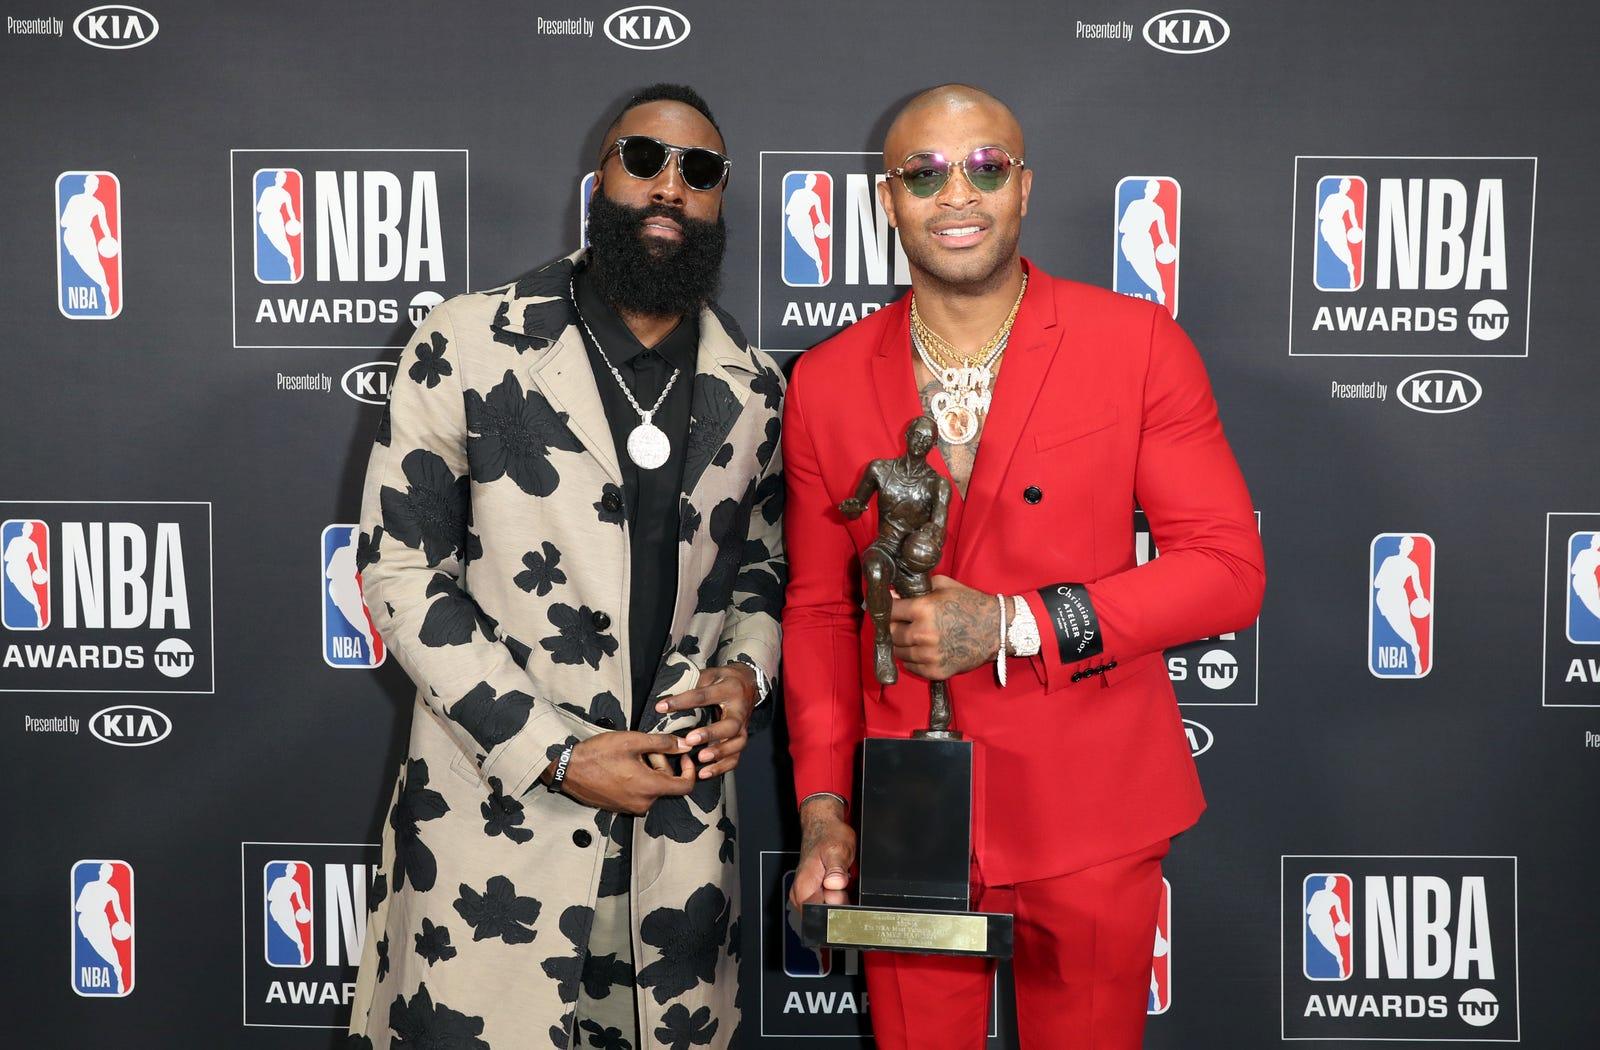 MVP winner James Harden poses with P.J. Tucker at the 2018 NBA Awards at Barkar Hangar on June 25, 2018 in Santa Monica, California.